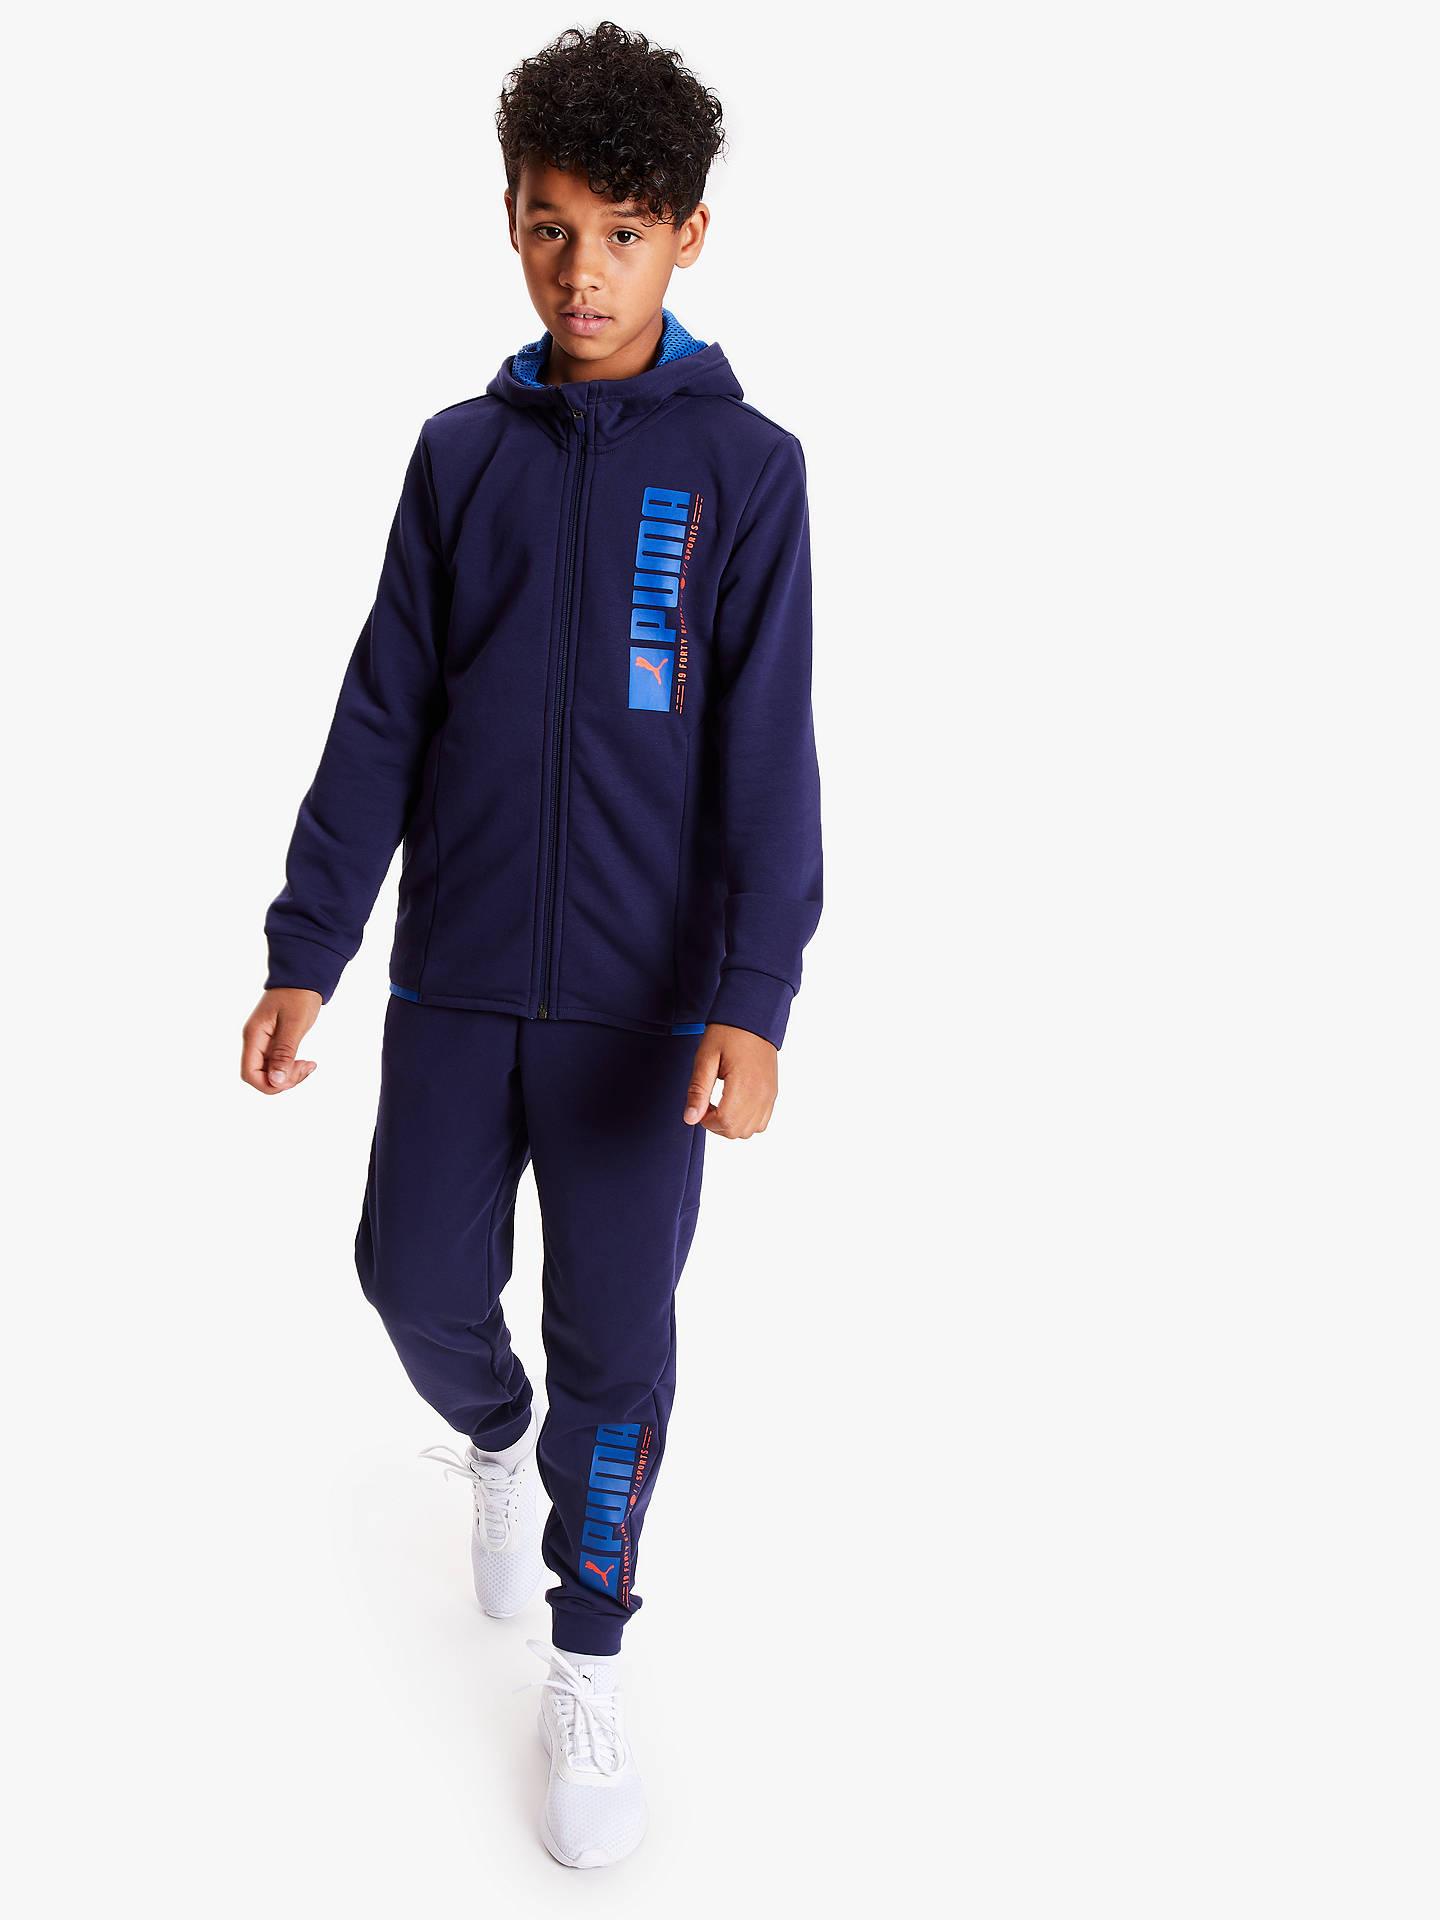 PUMA Boys Active Hoodie Sports & Outdoors Hoodies & Sweatshirts